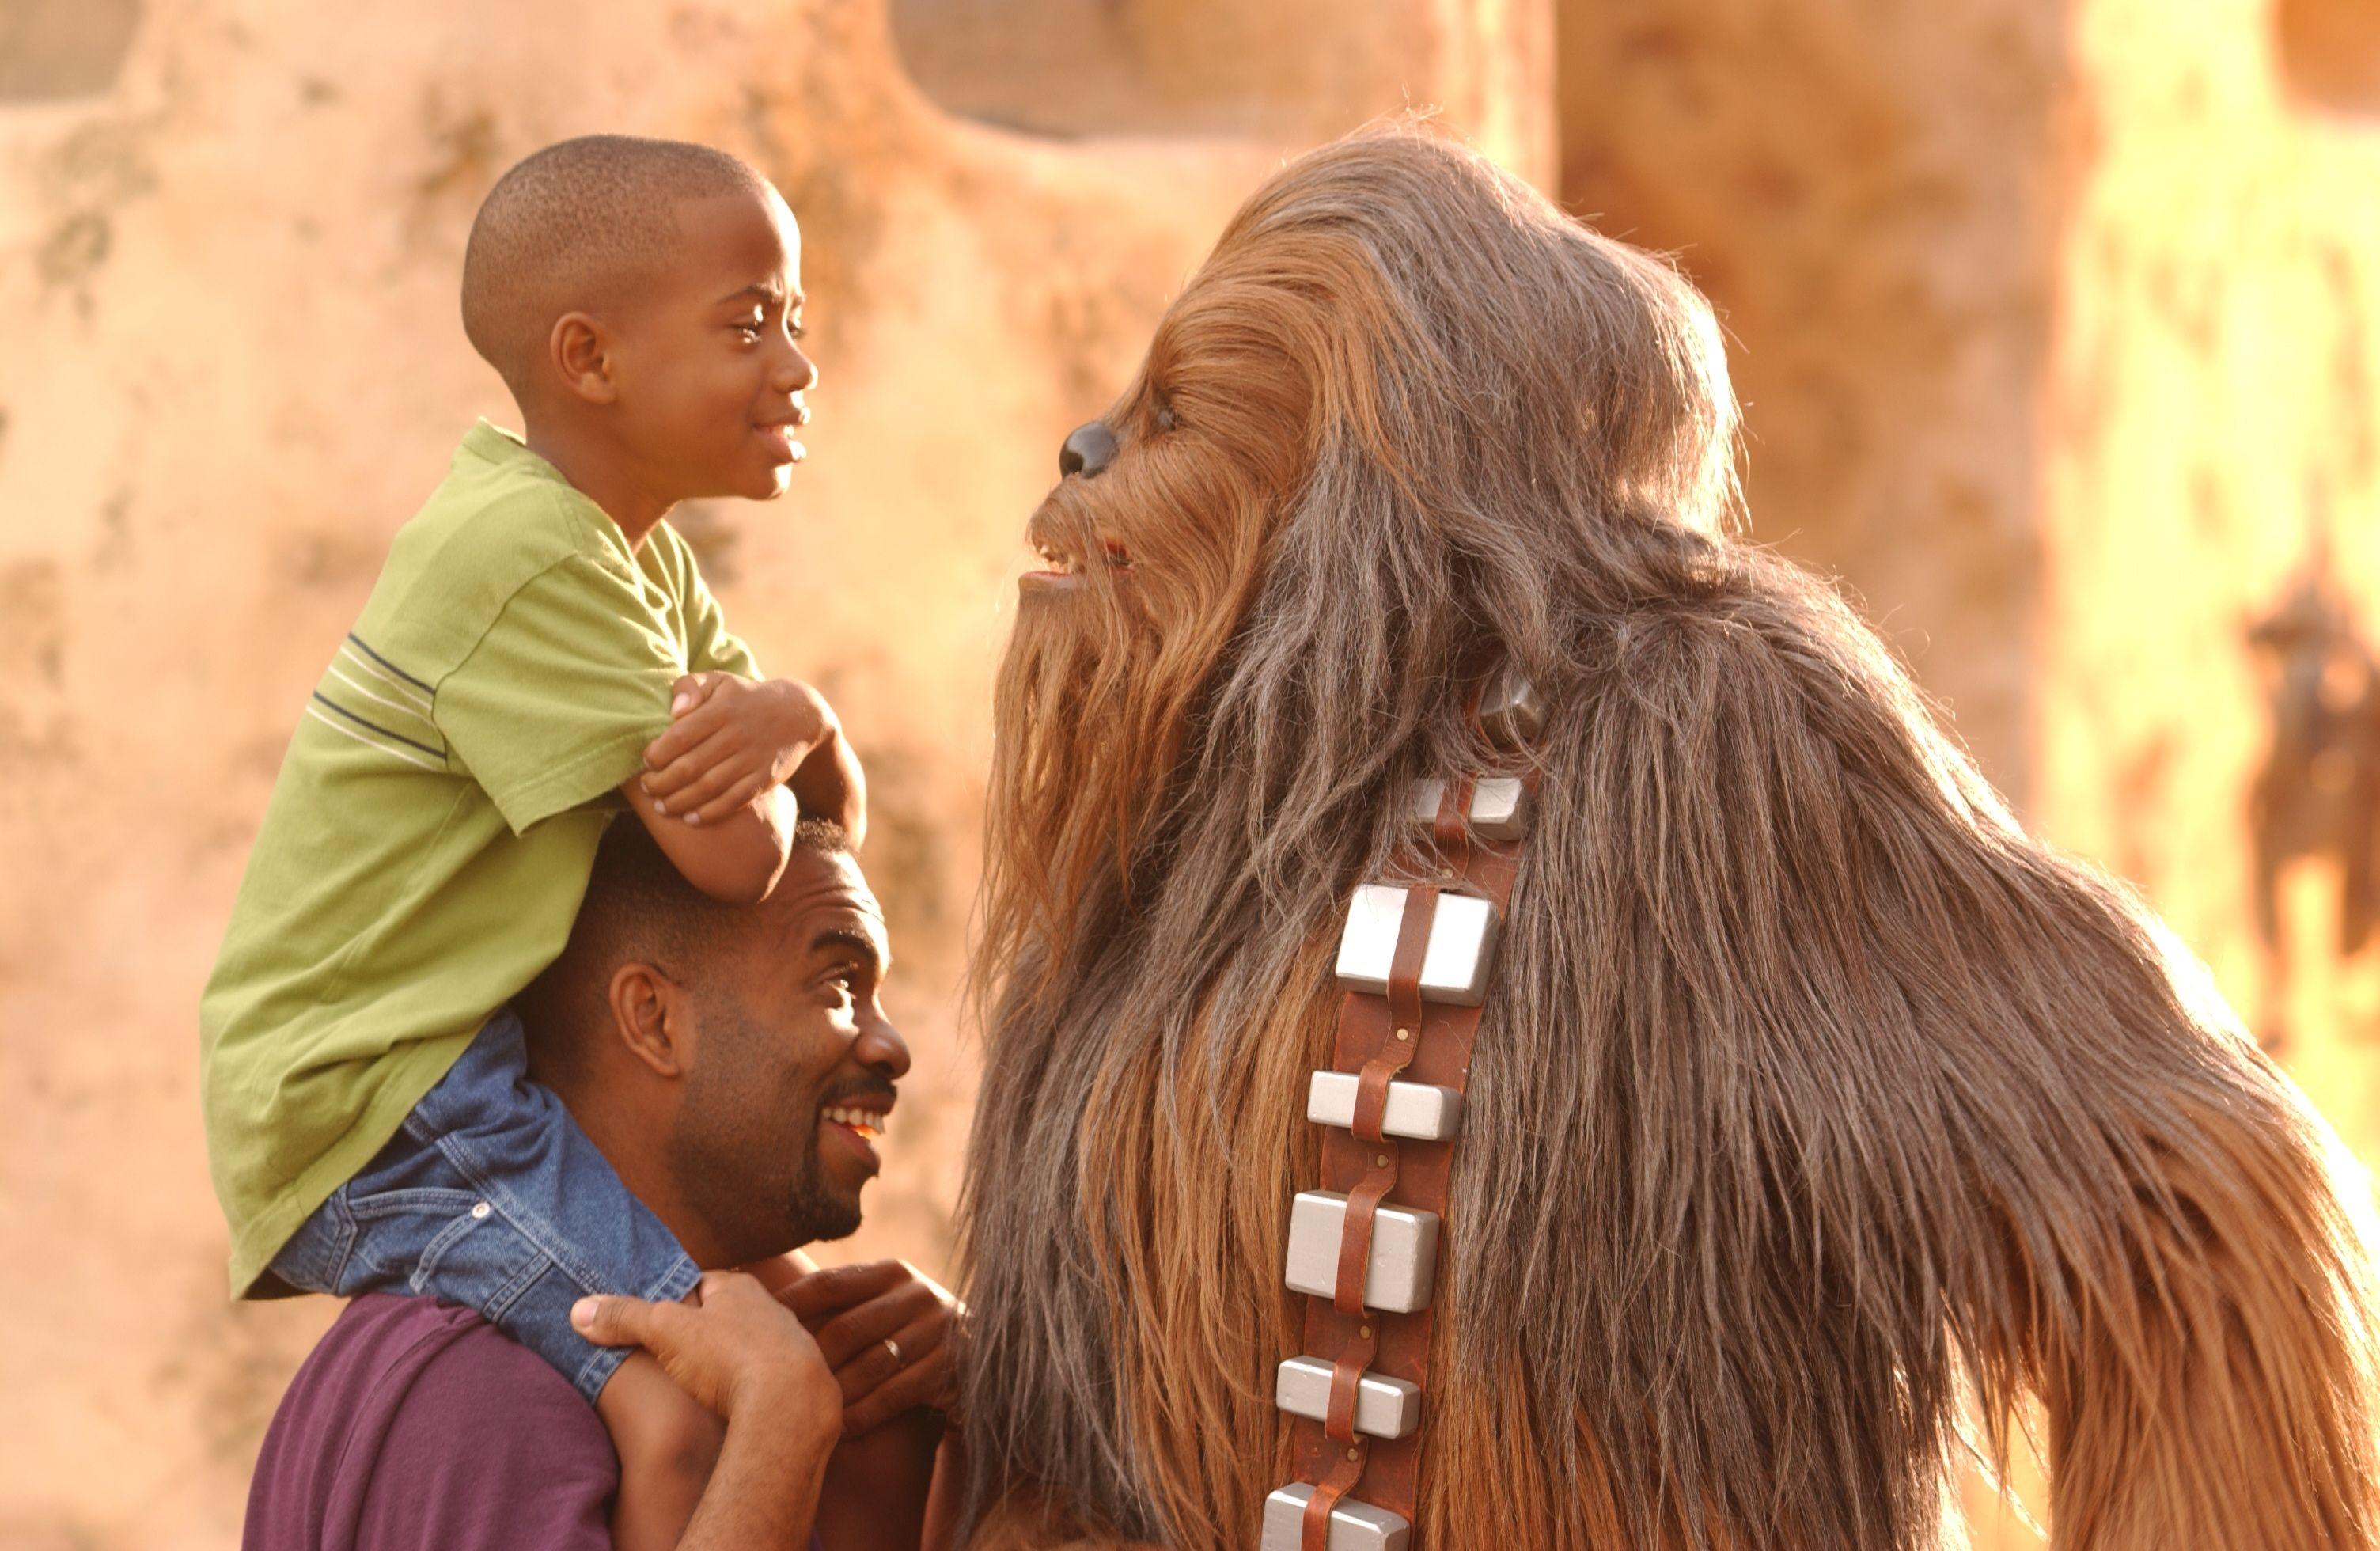 Star Wars Weekends at Walt Disney World